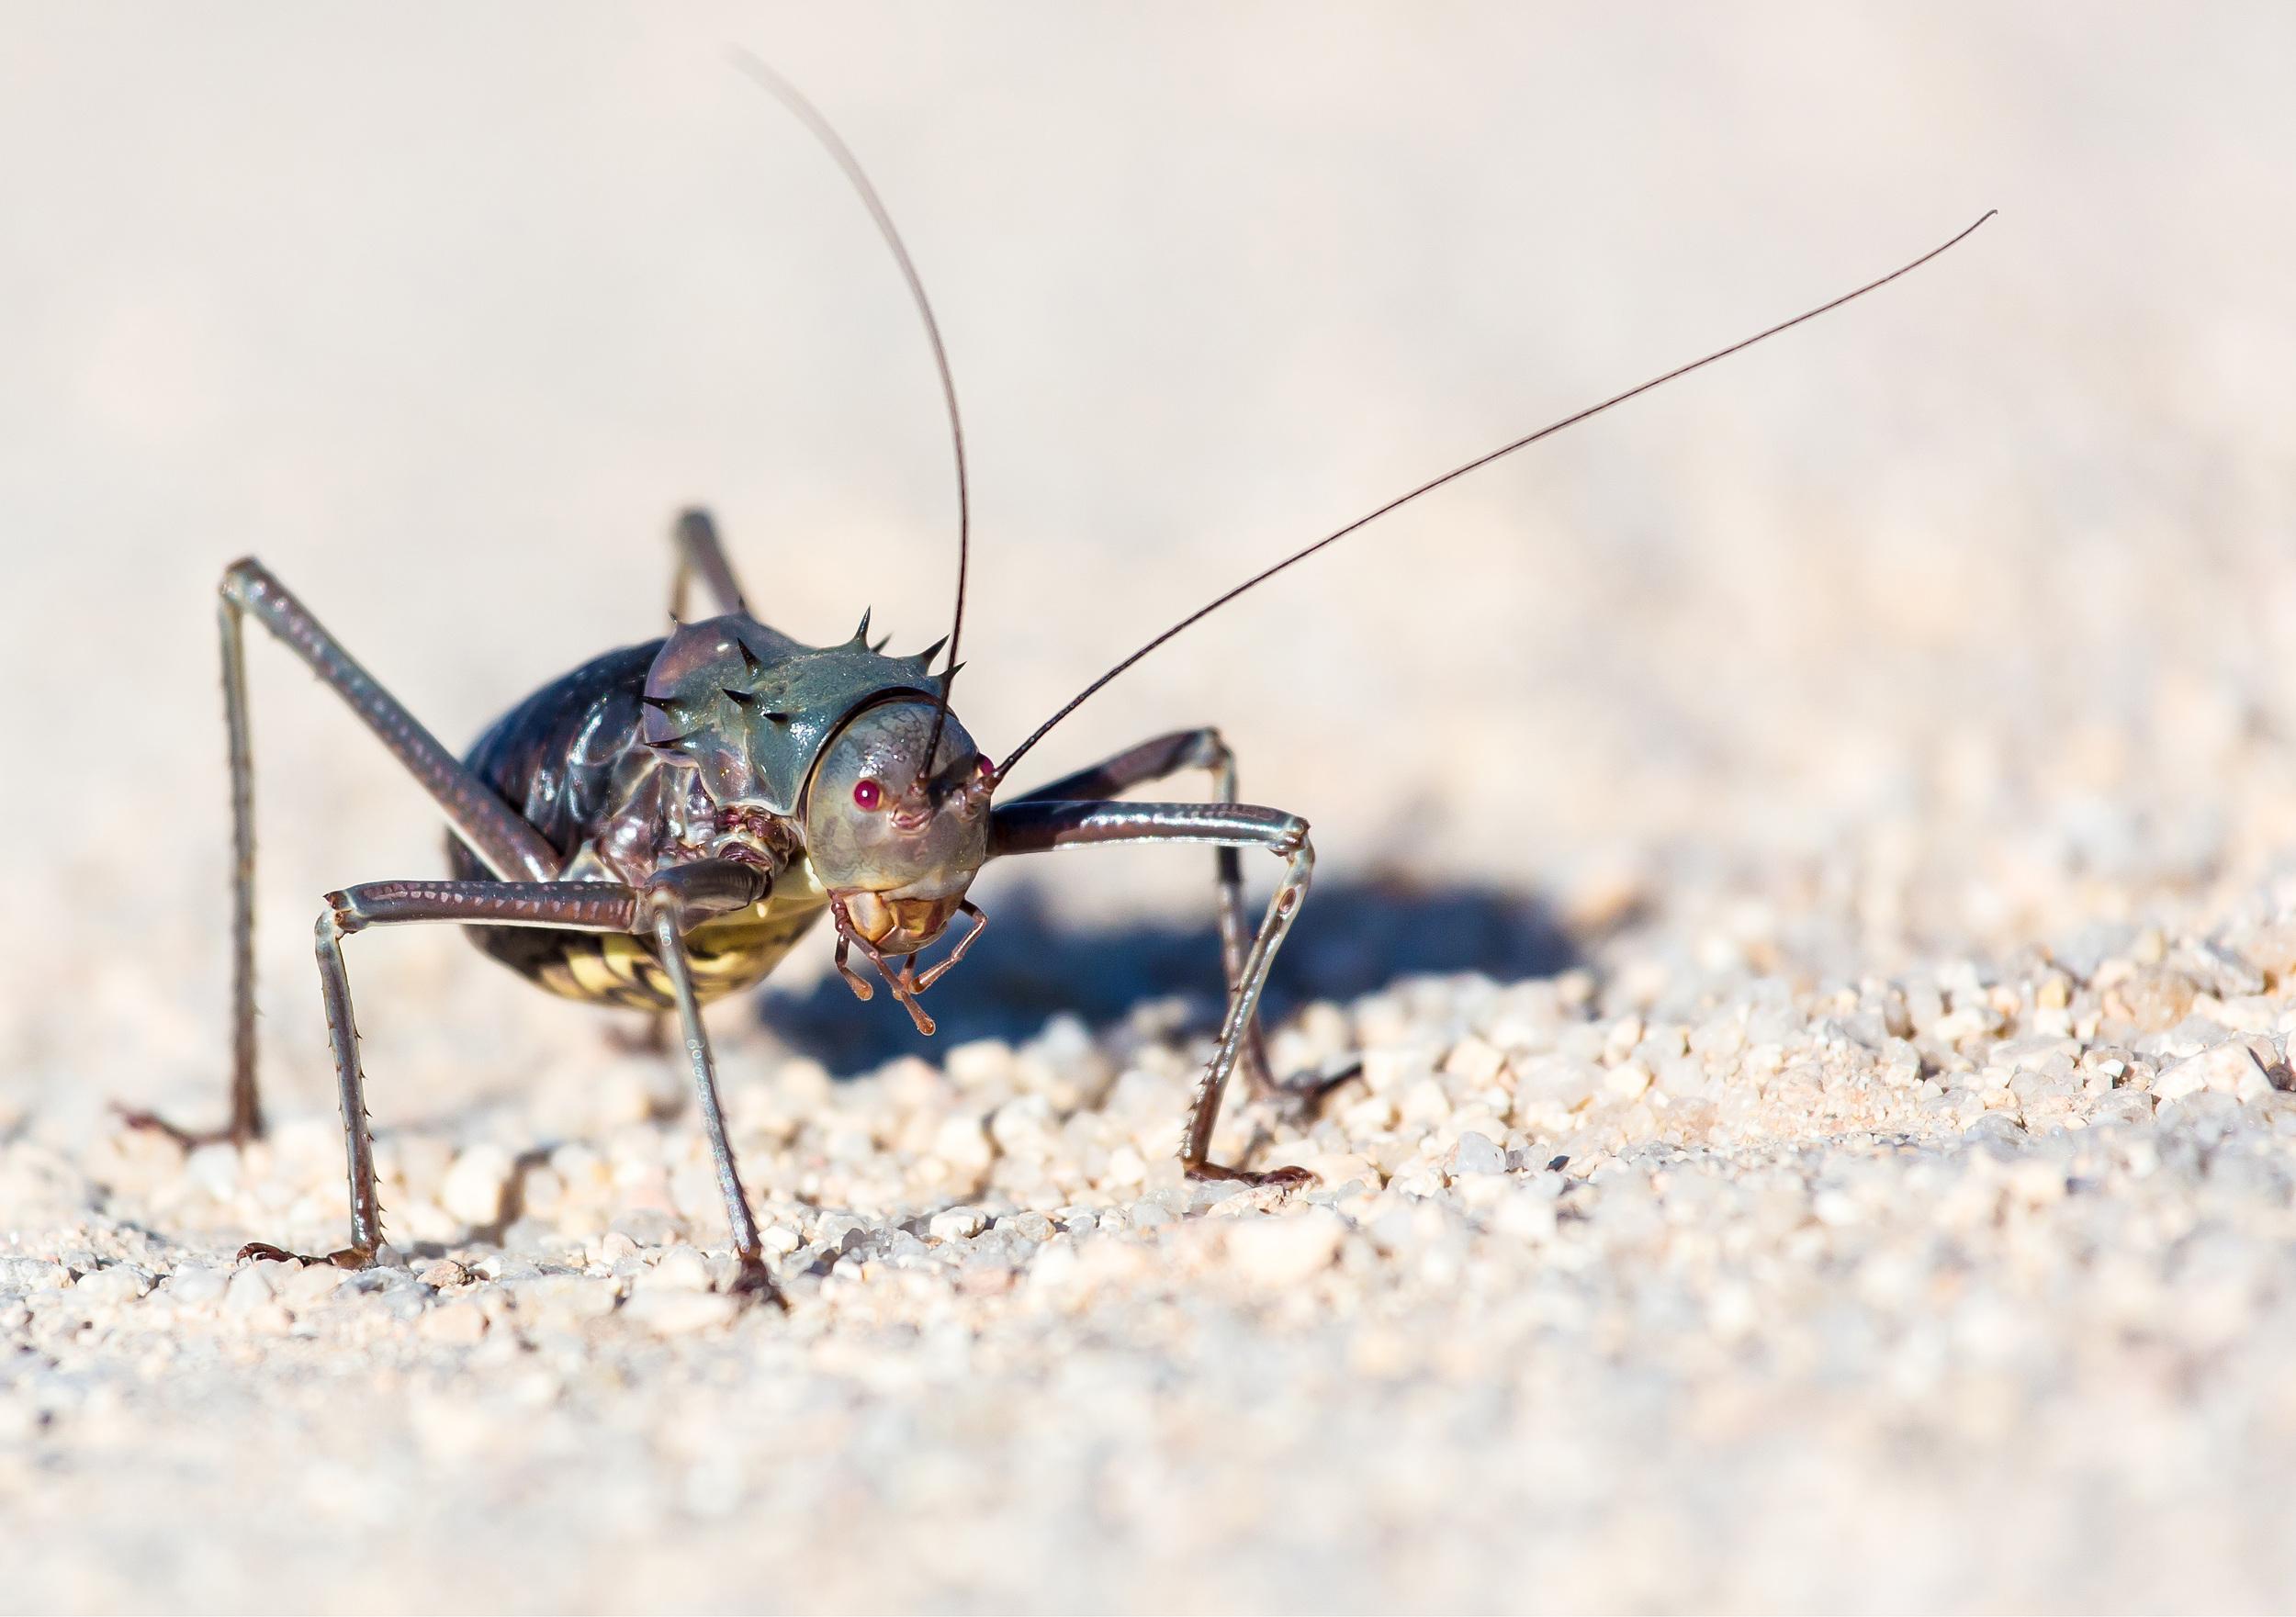 A bush cricket shot with a telephoto lens.